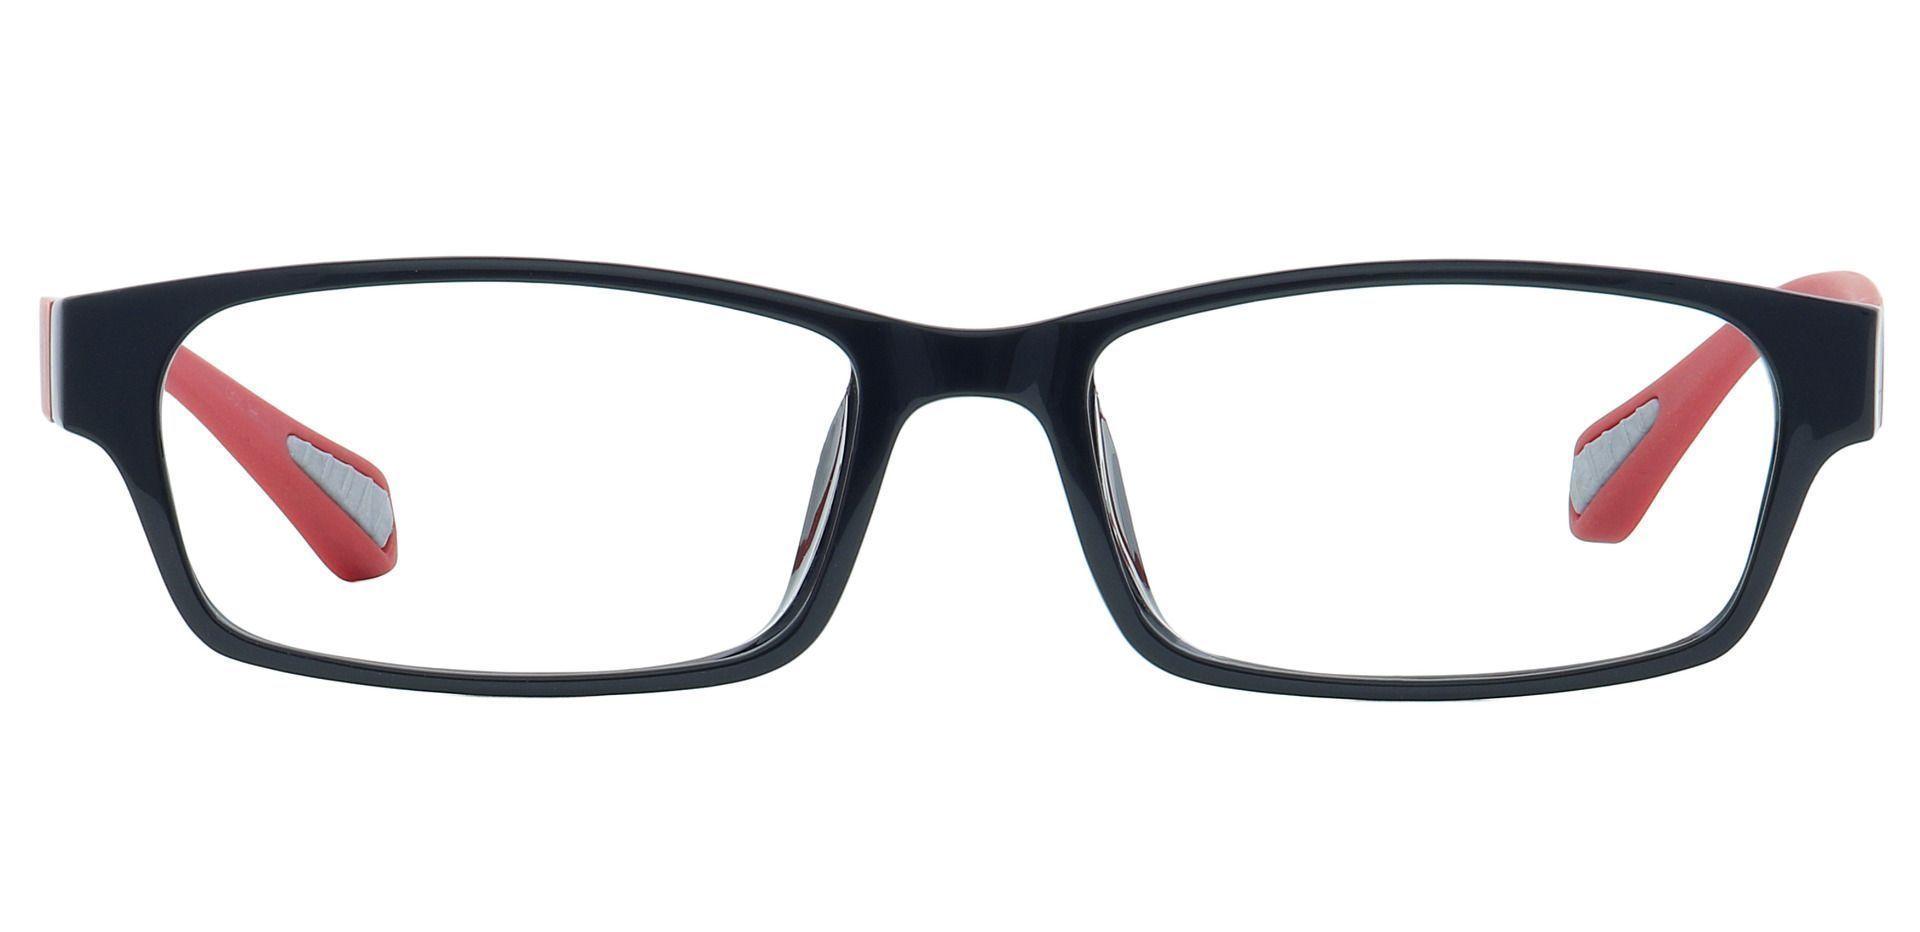 Diego Rectangle Prescription Glasses - Black